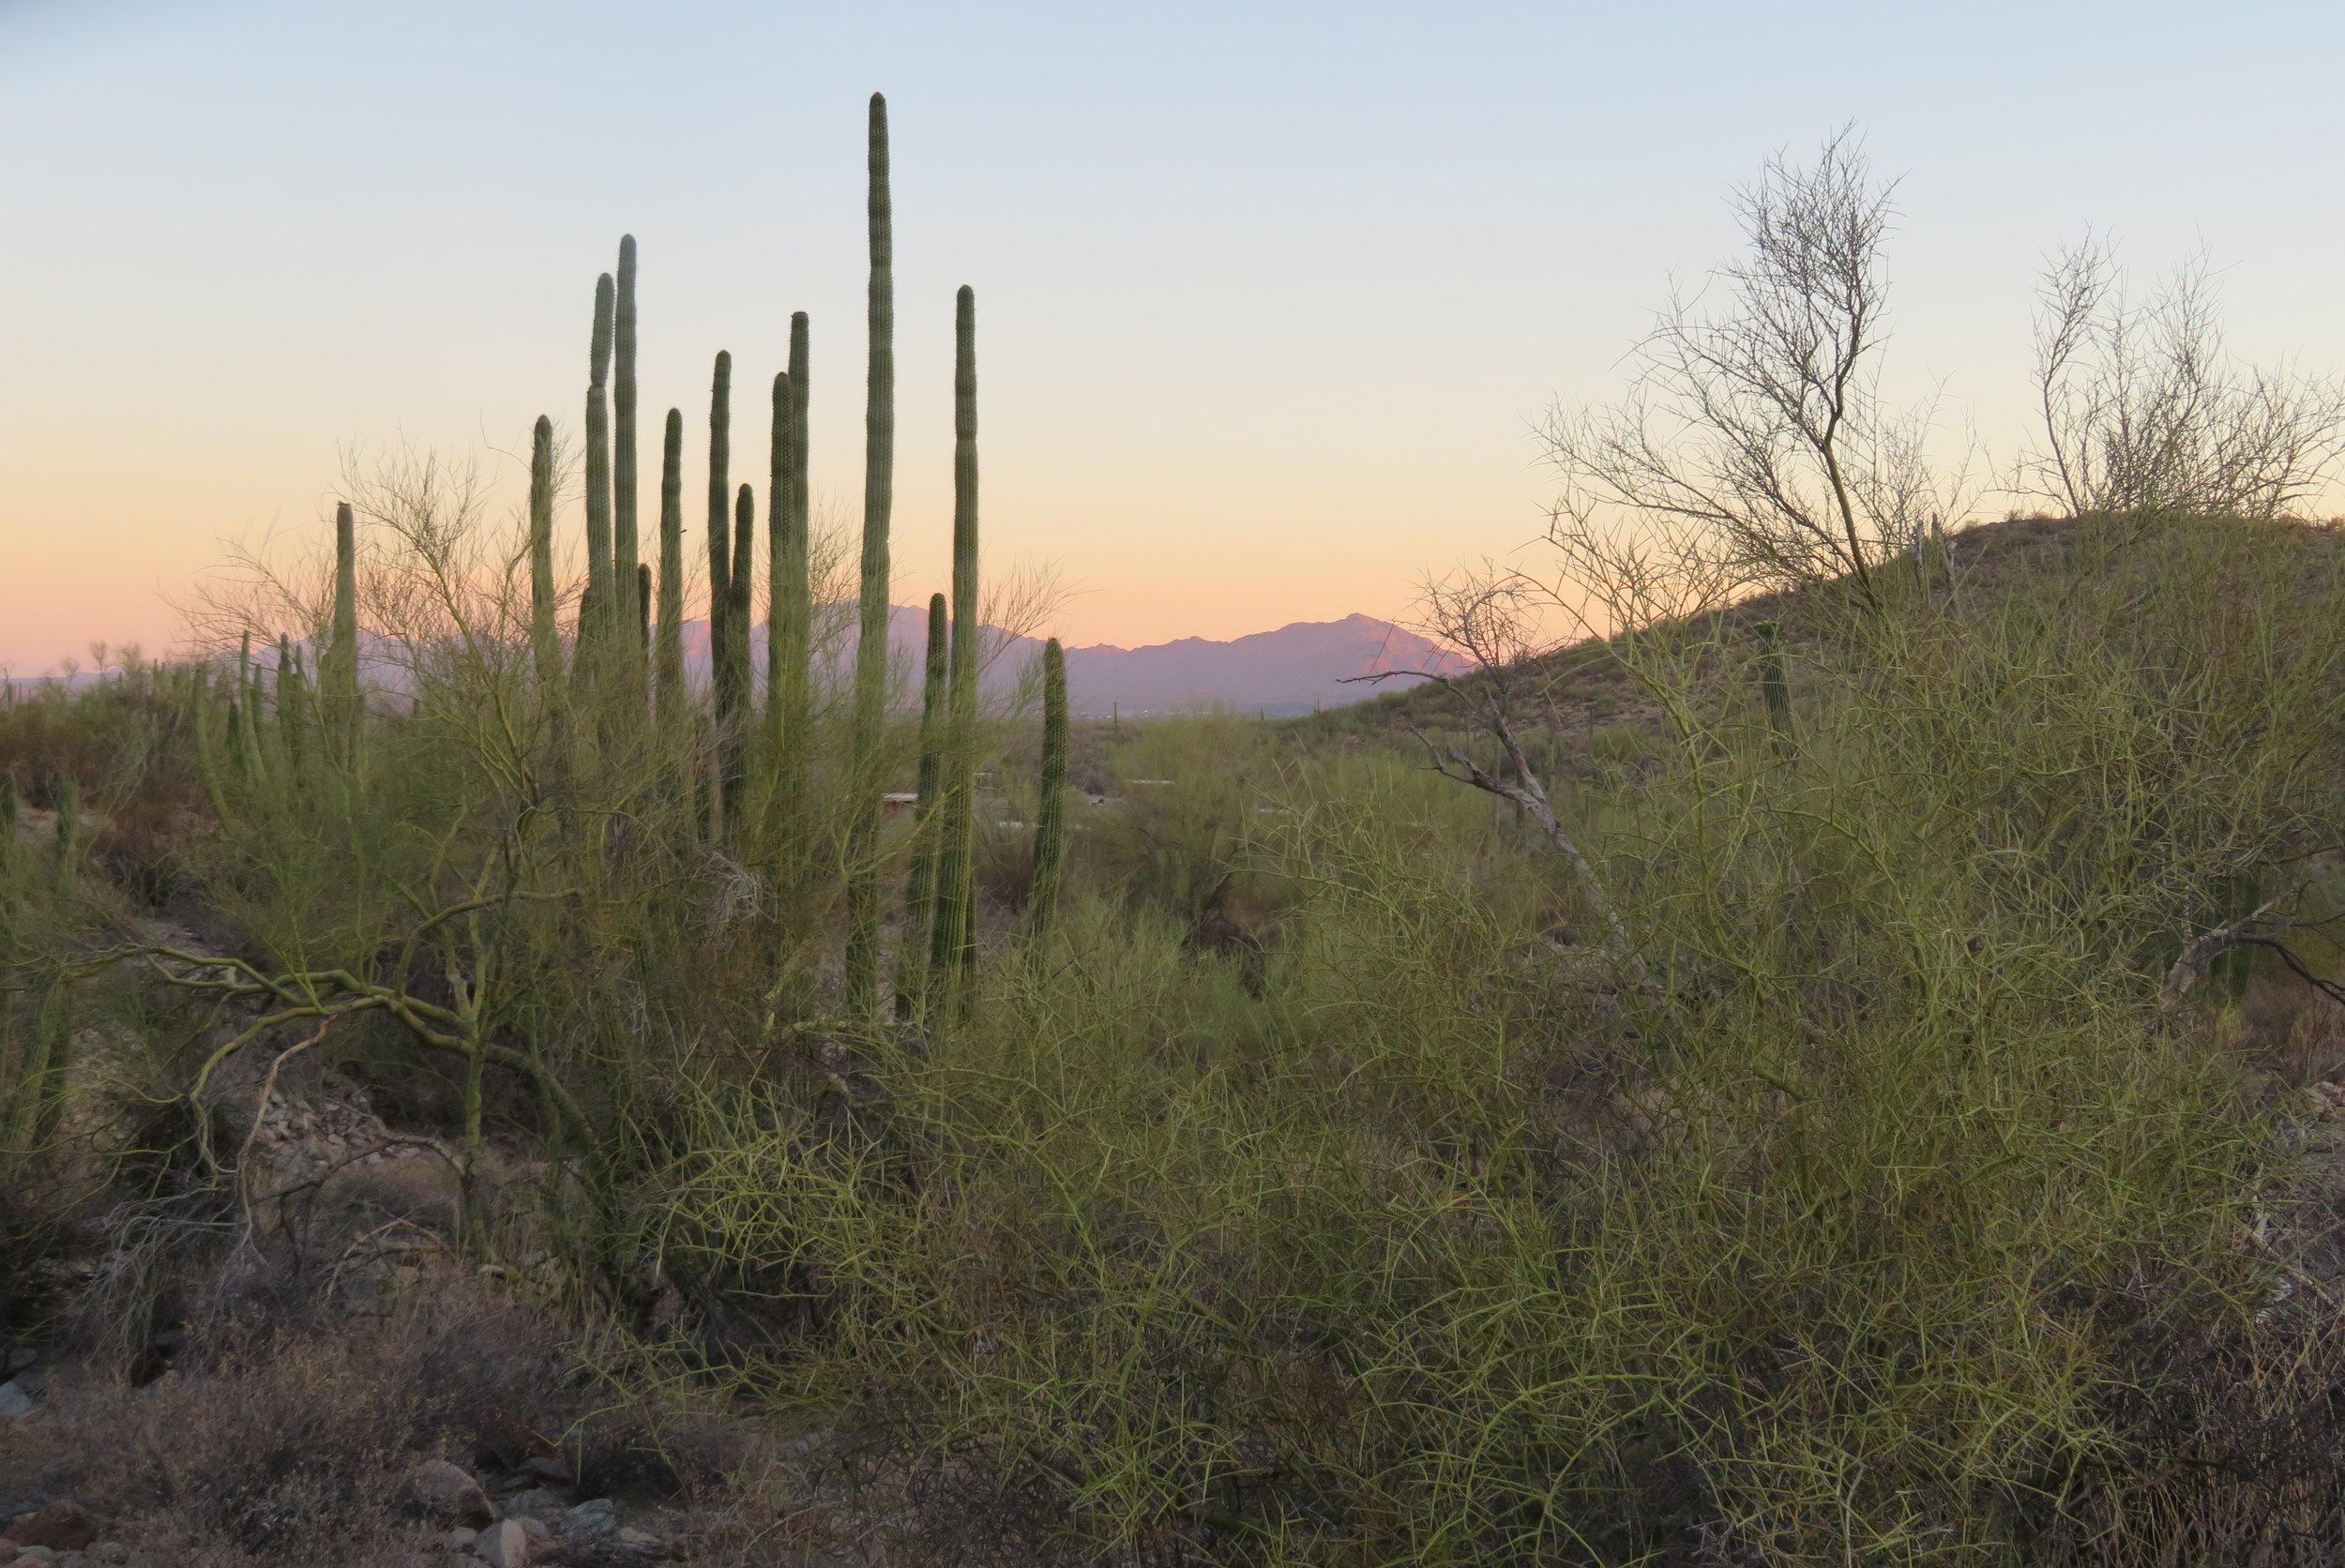 Organ Pipe Cactus National Monument  - AriZona - May 2018